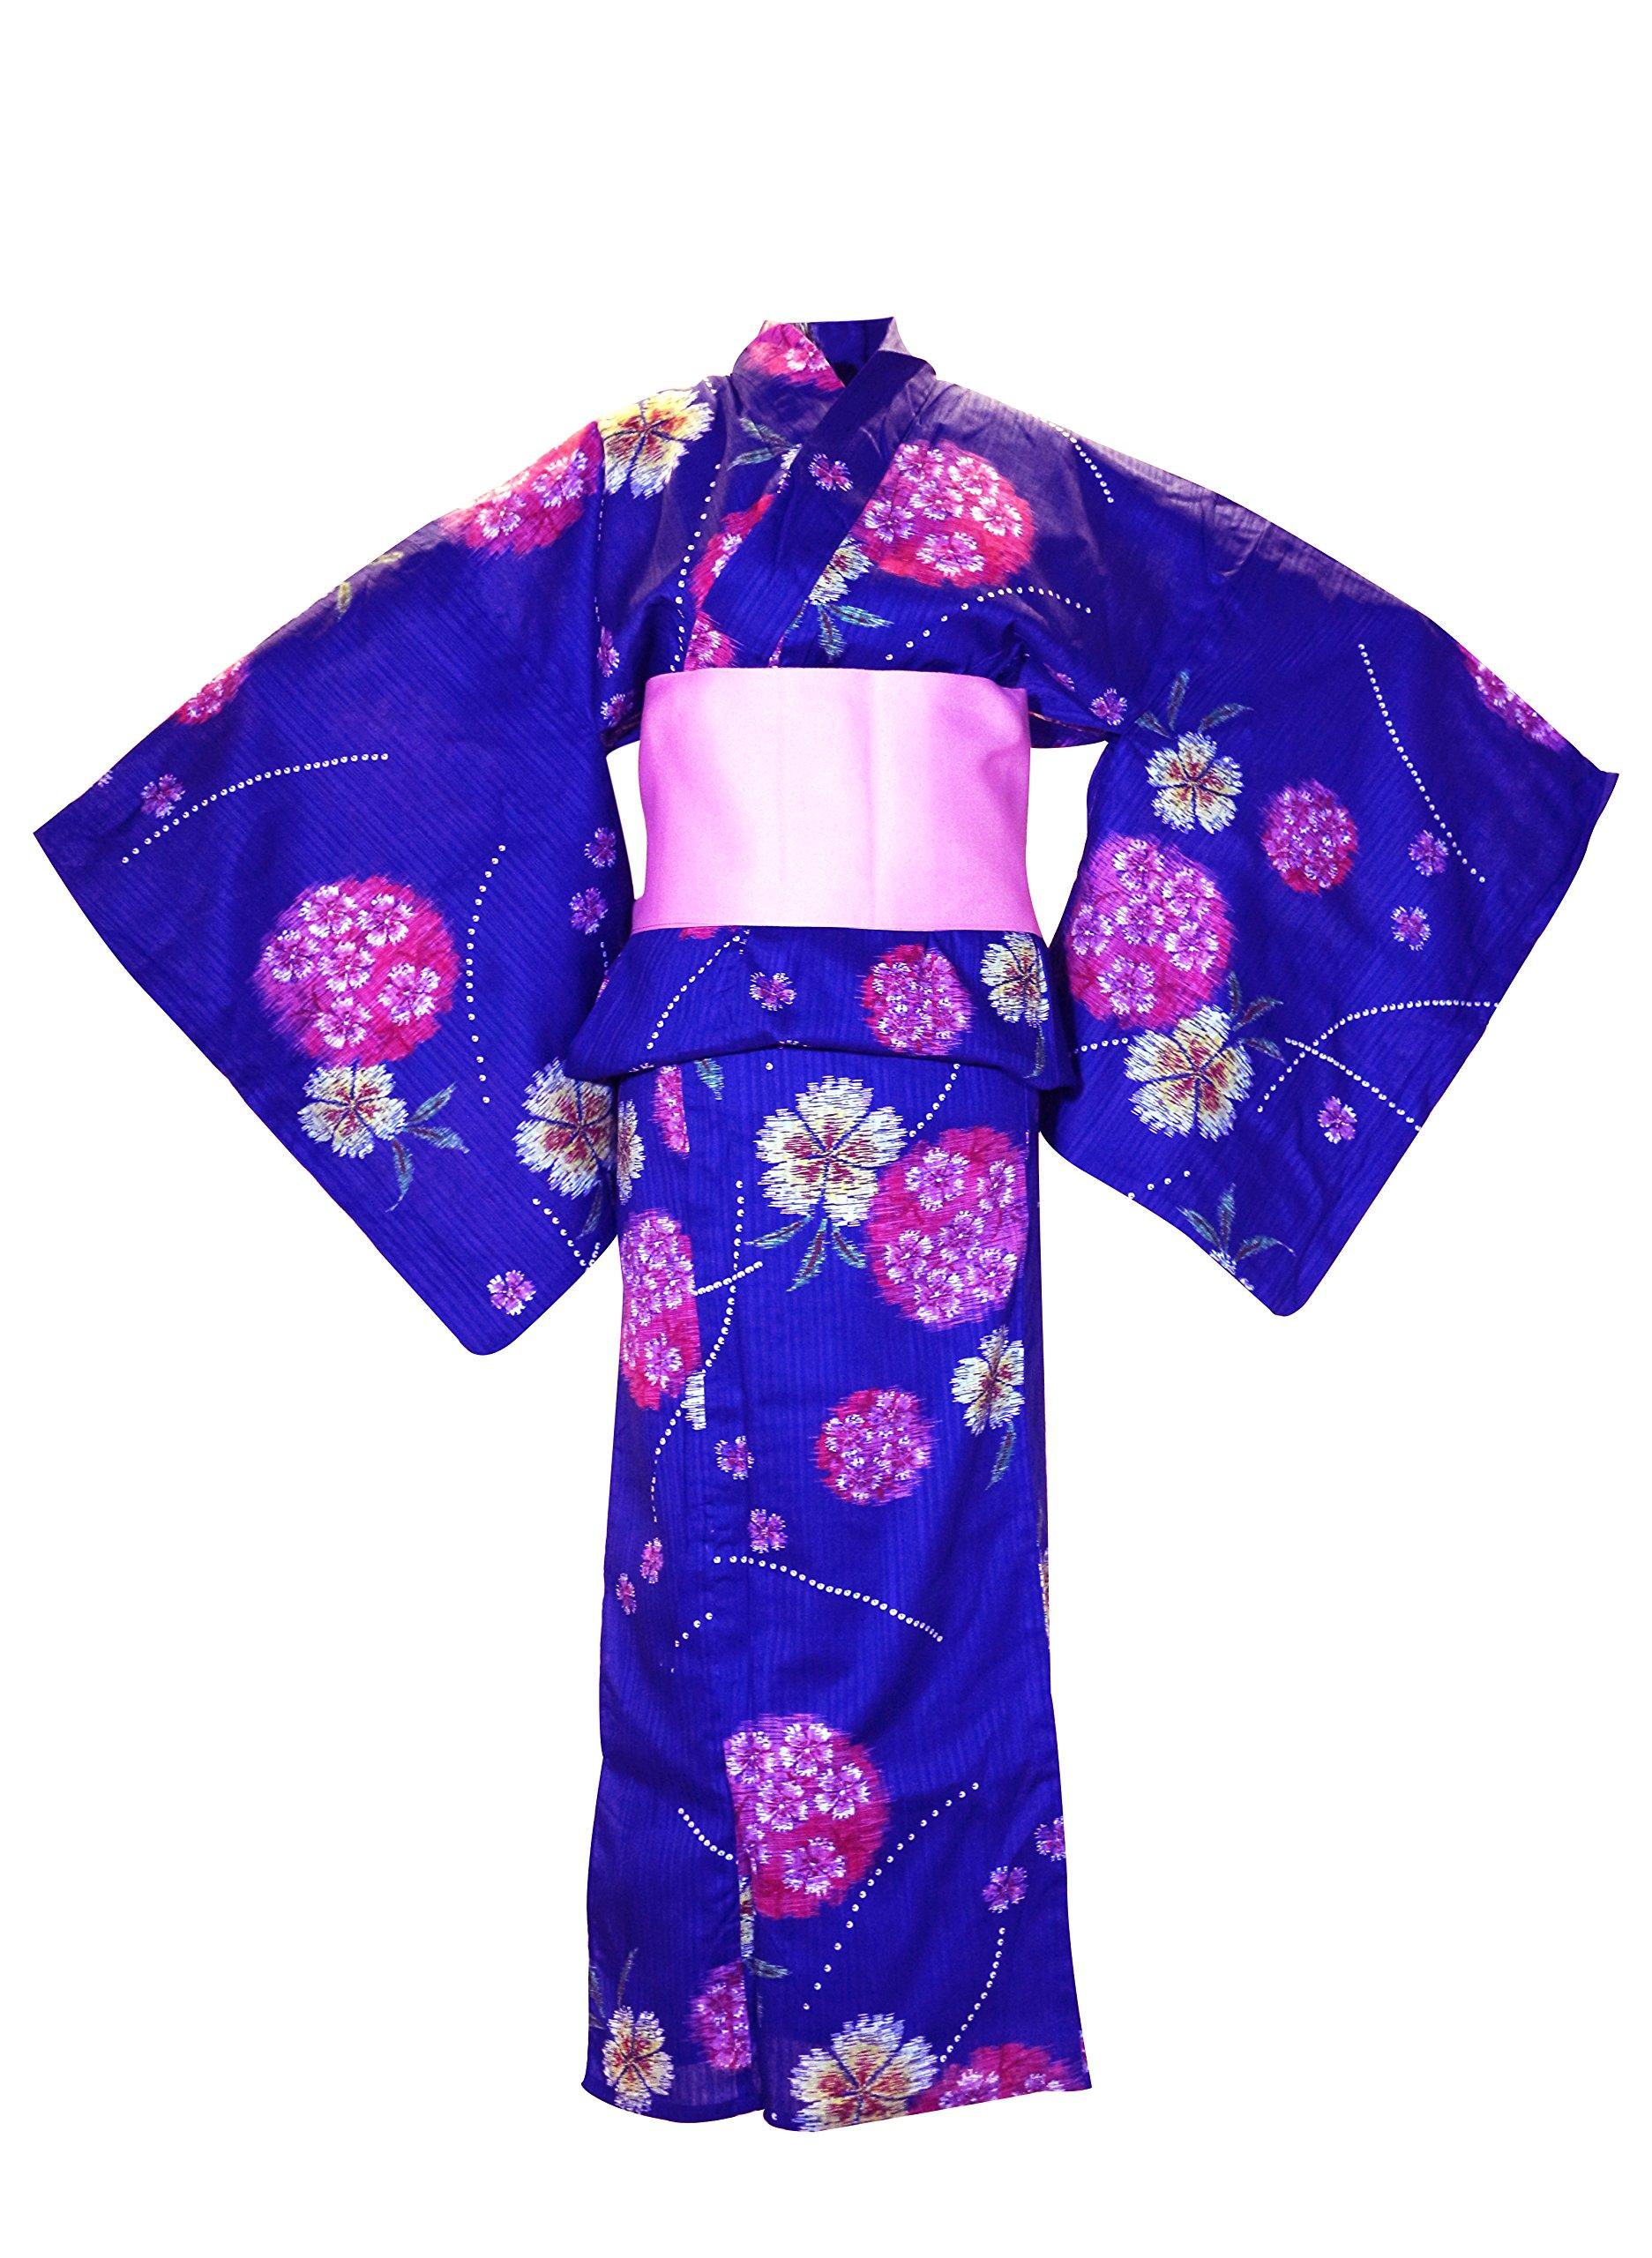 myKimono Women's Traditional Japanese Kimono Robe Yukata 504 with Pink OBI Belt / Blue with Flower Pattern